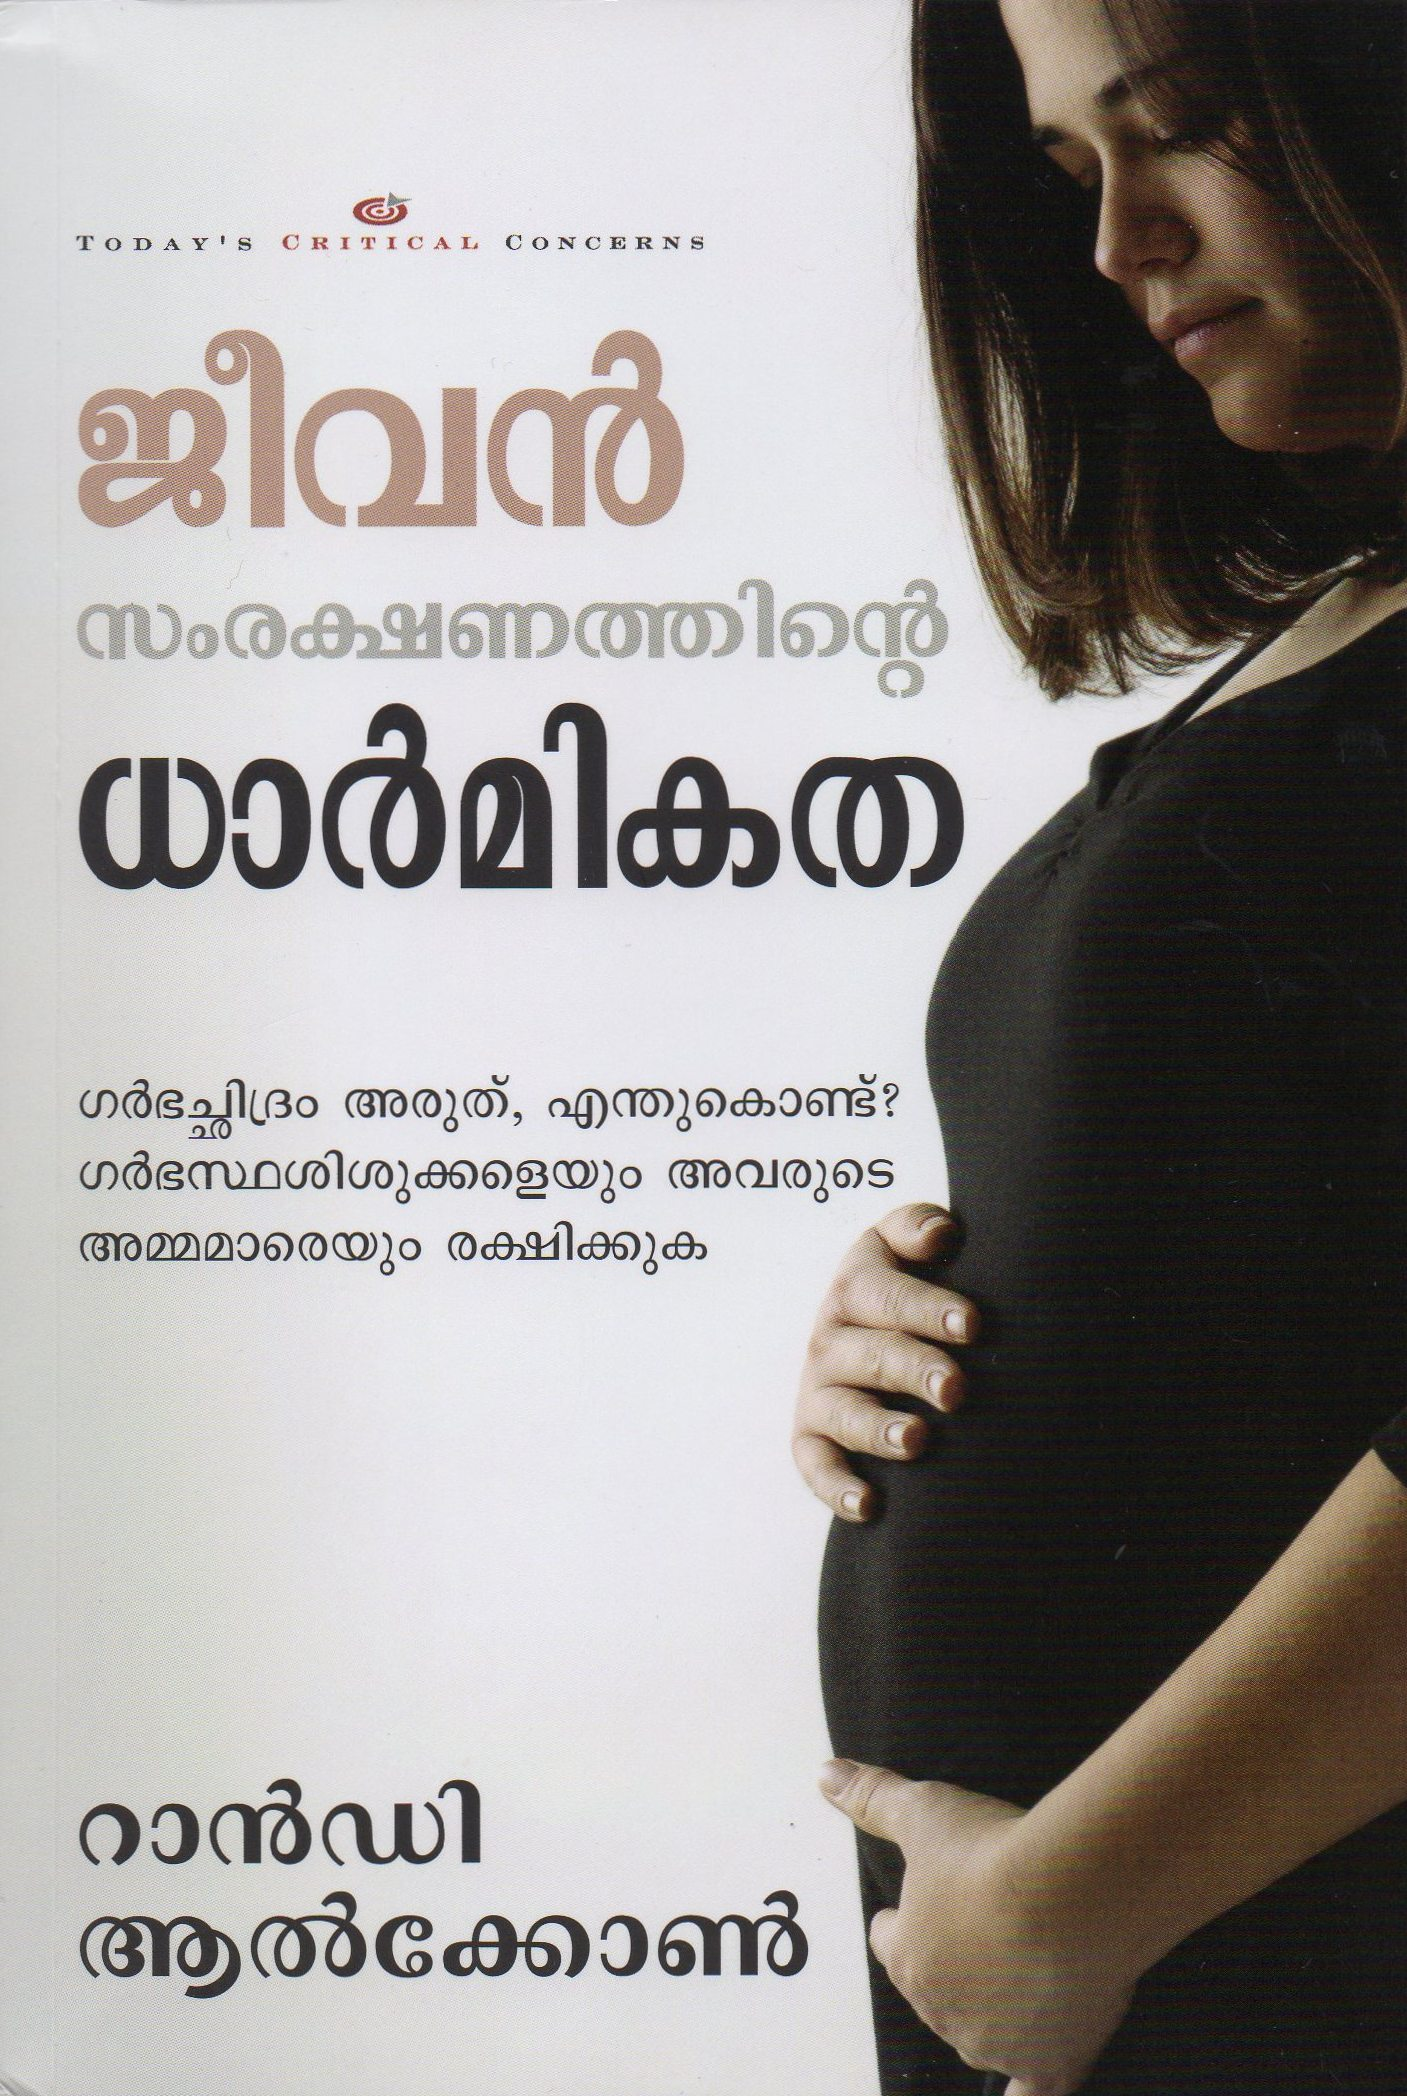 whyprolife-malayalam.jpg